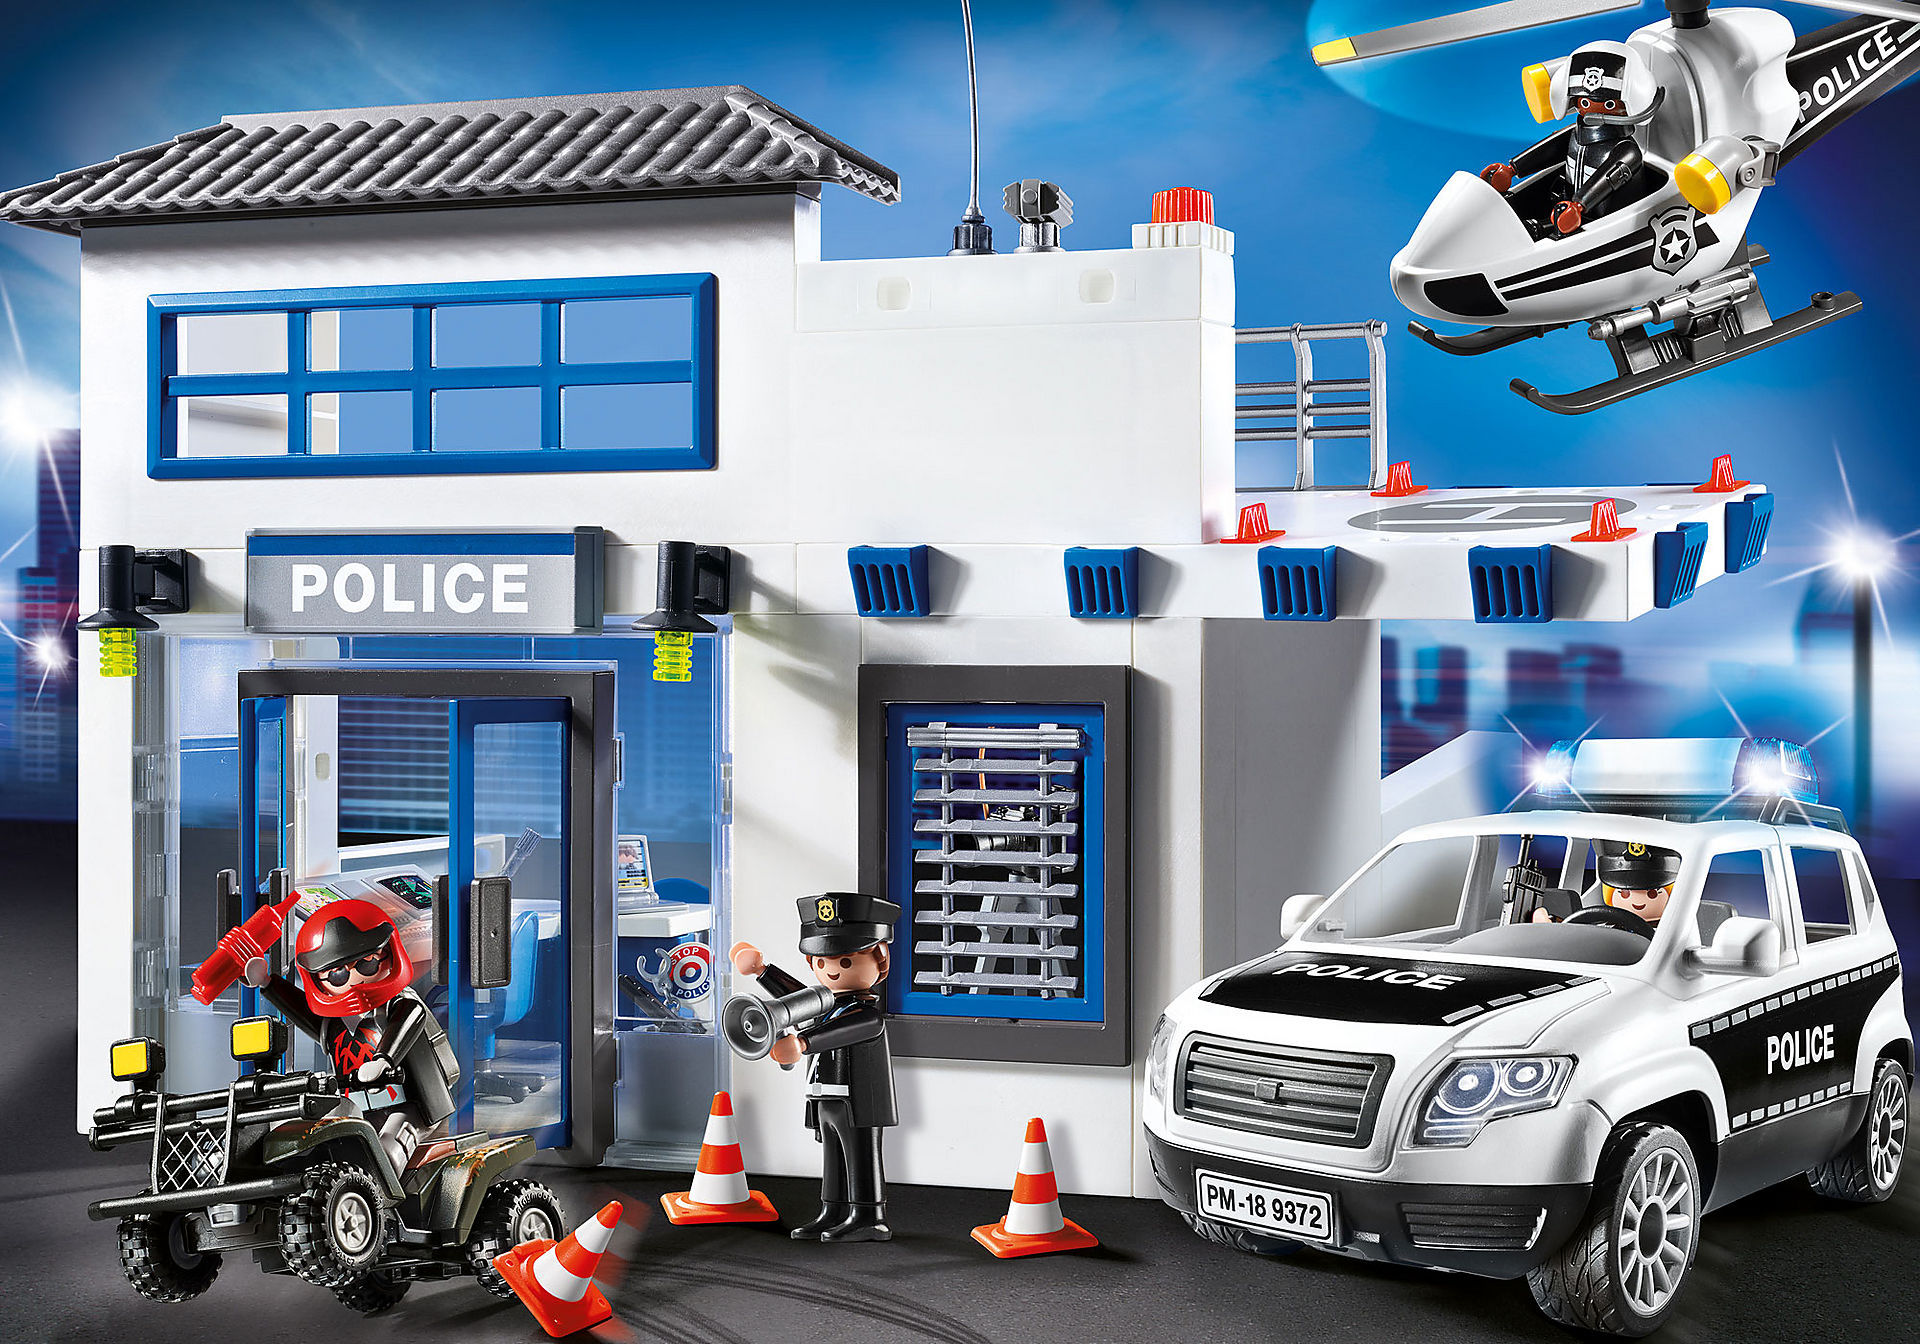 http://media.playmobil.com/i/playmobil/9372_product_detail/Poste de police et véhicules